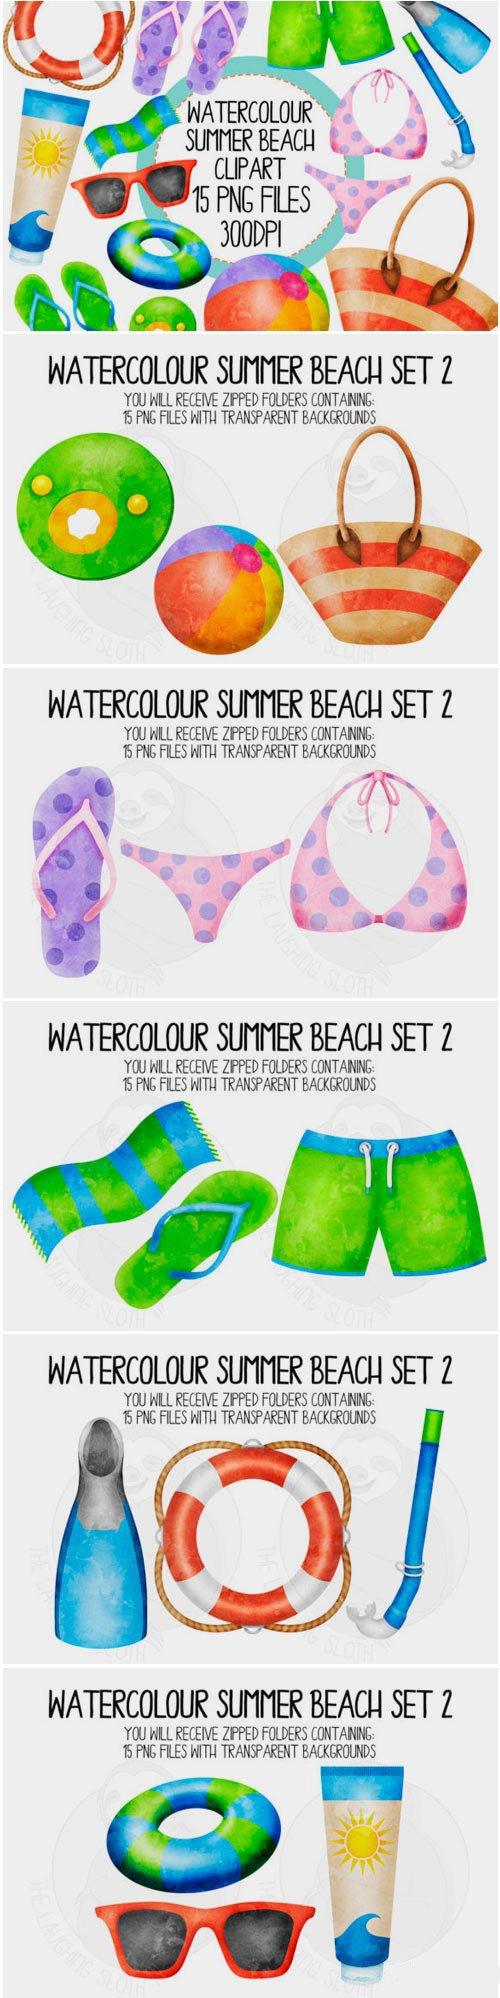 Watercolour Summer Beach Set 2 1575861